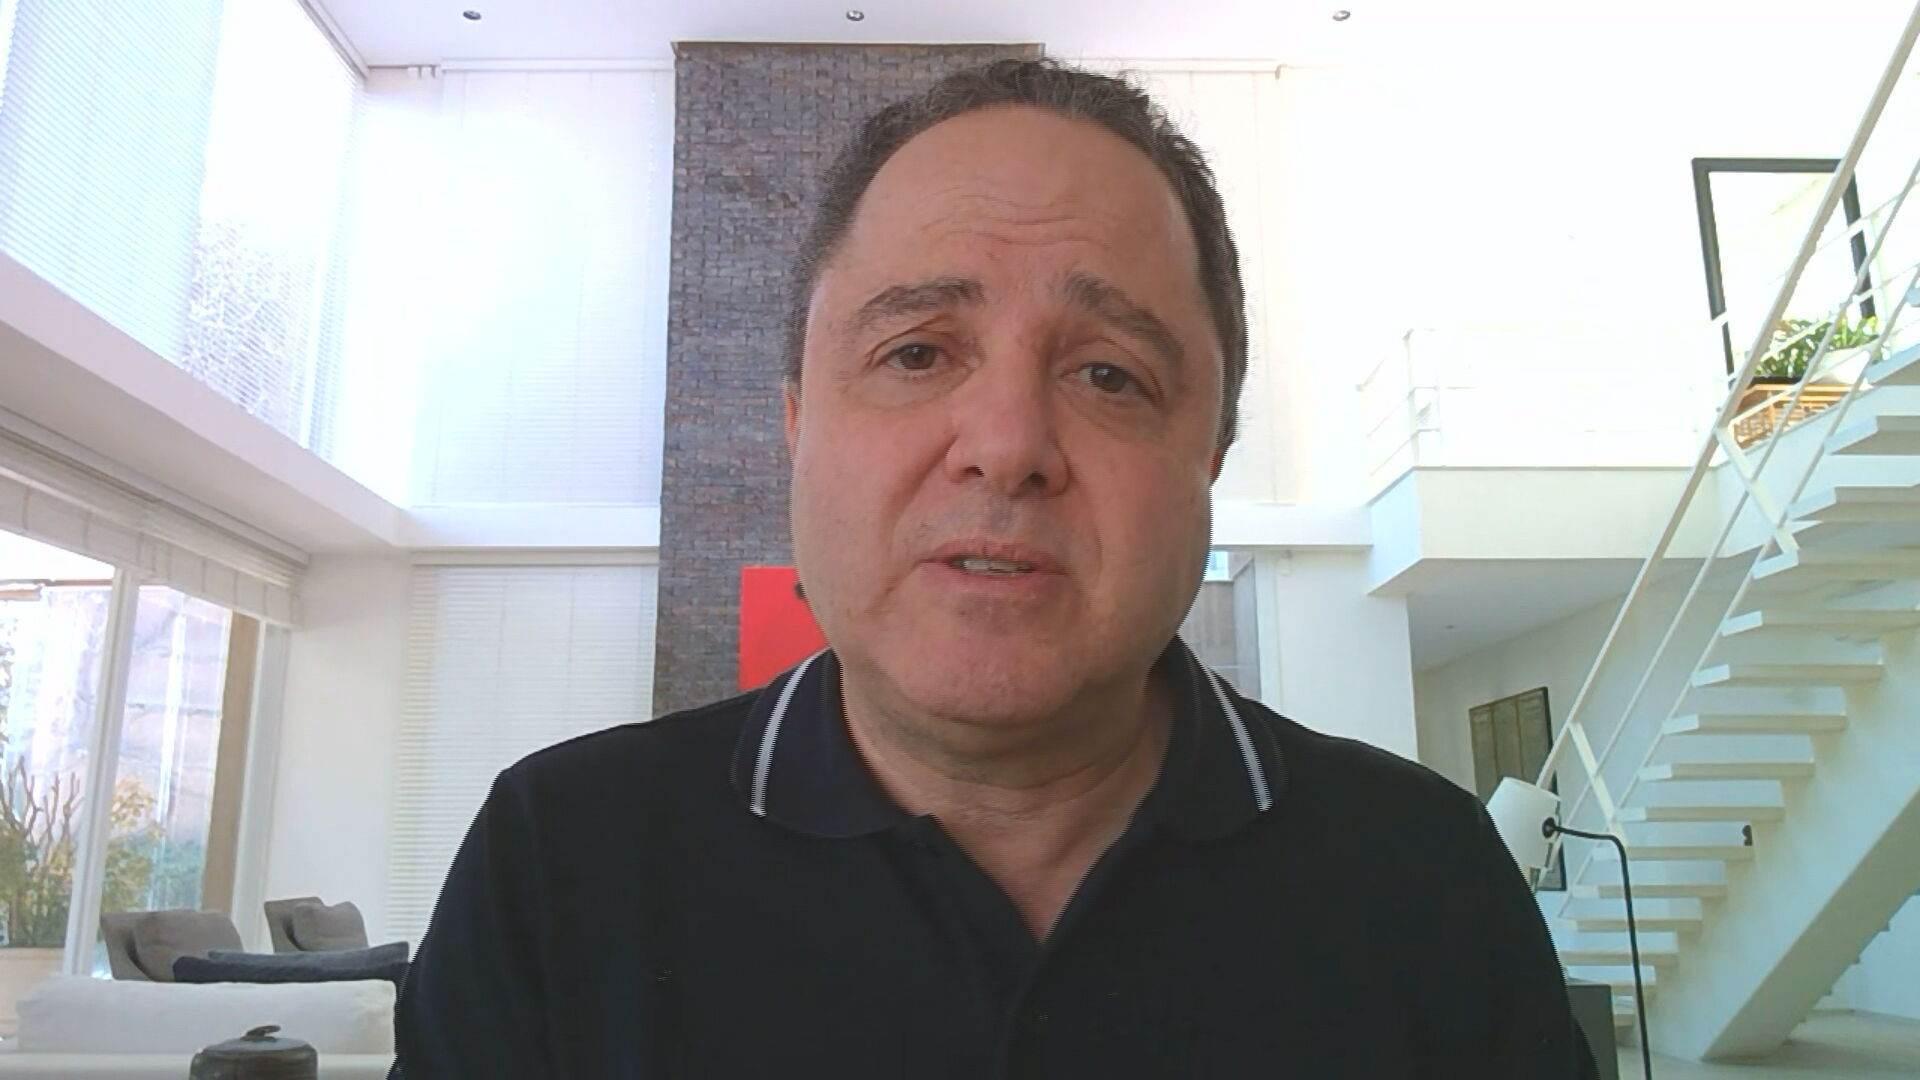 Cardiologista Roberto Kalil (14-08-2021)